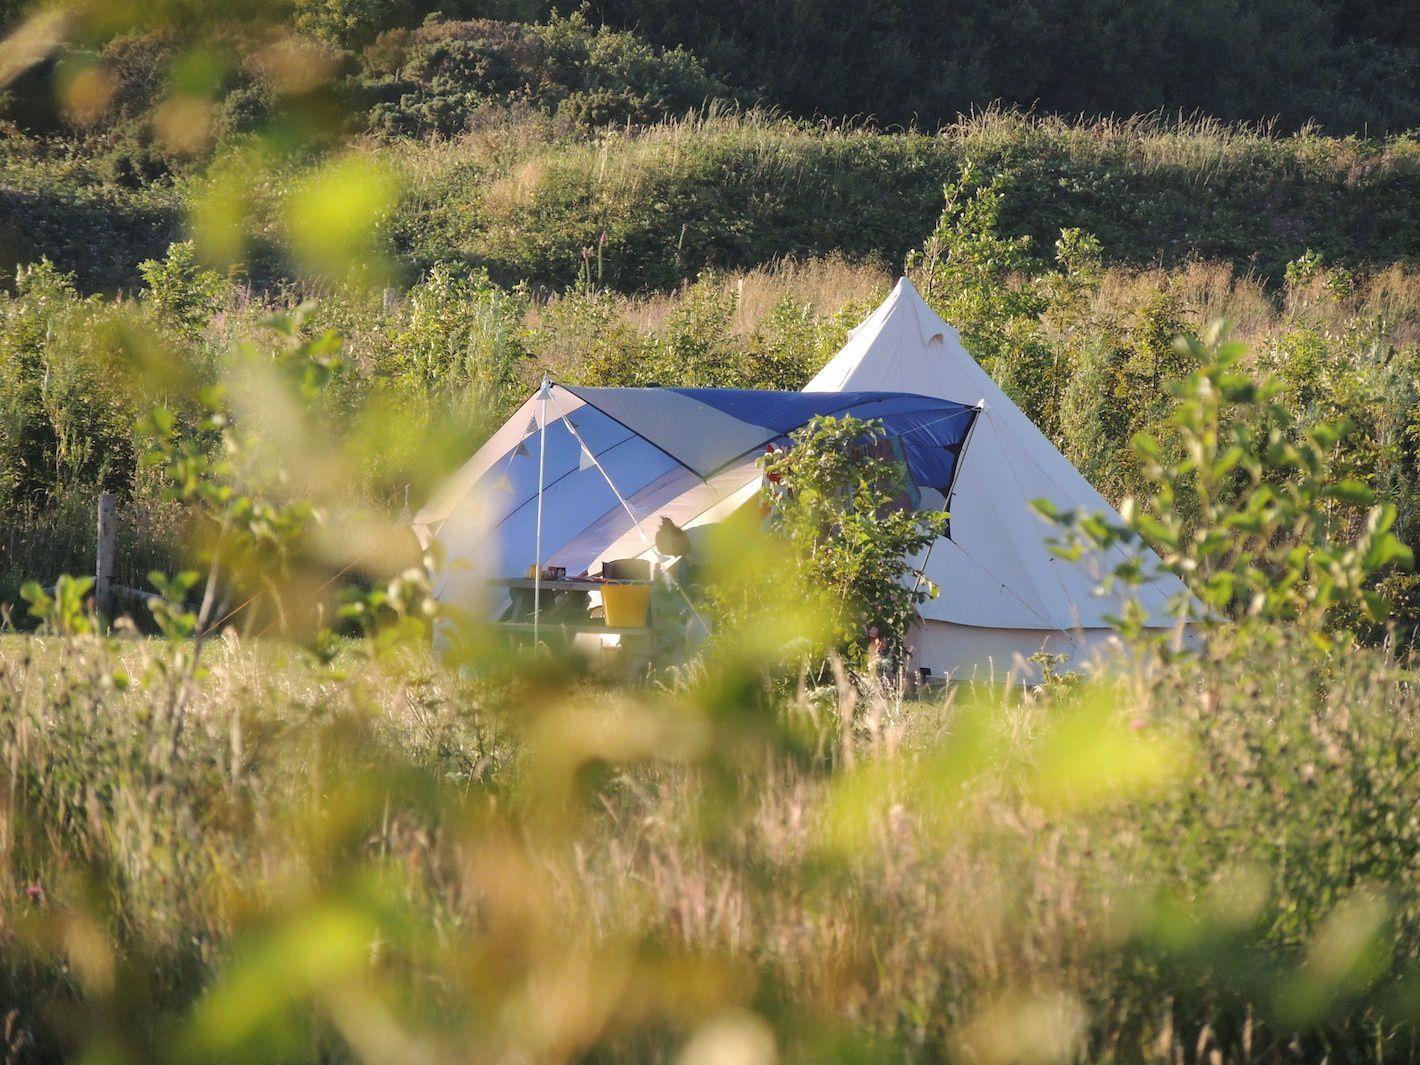 Greener Camping Club Campsites